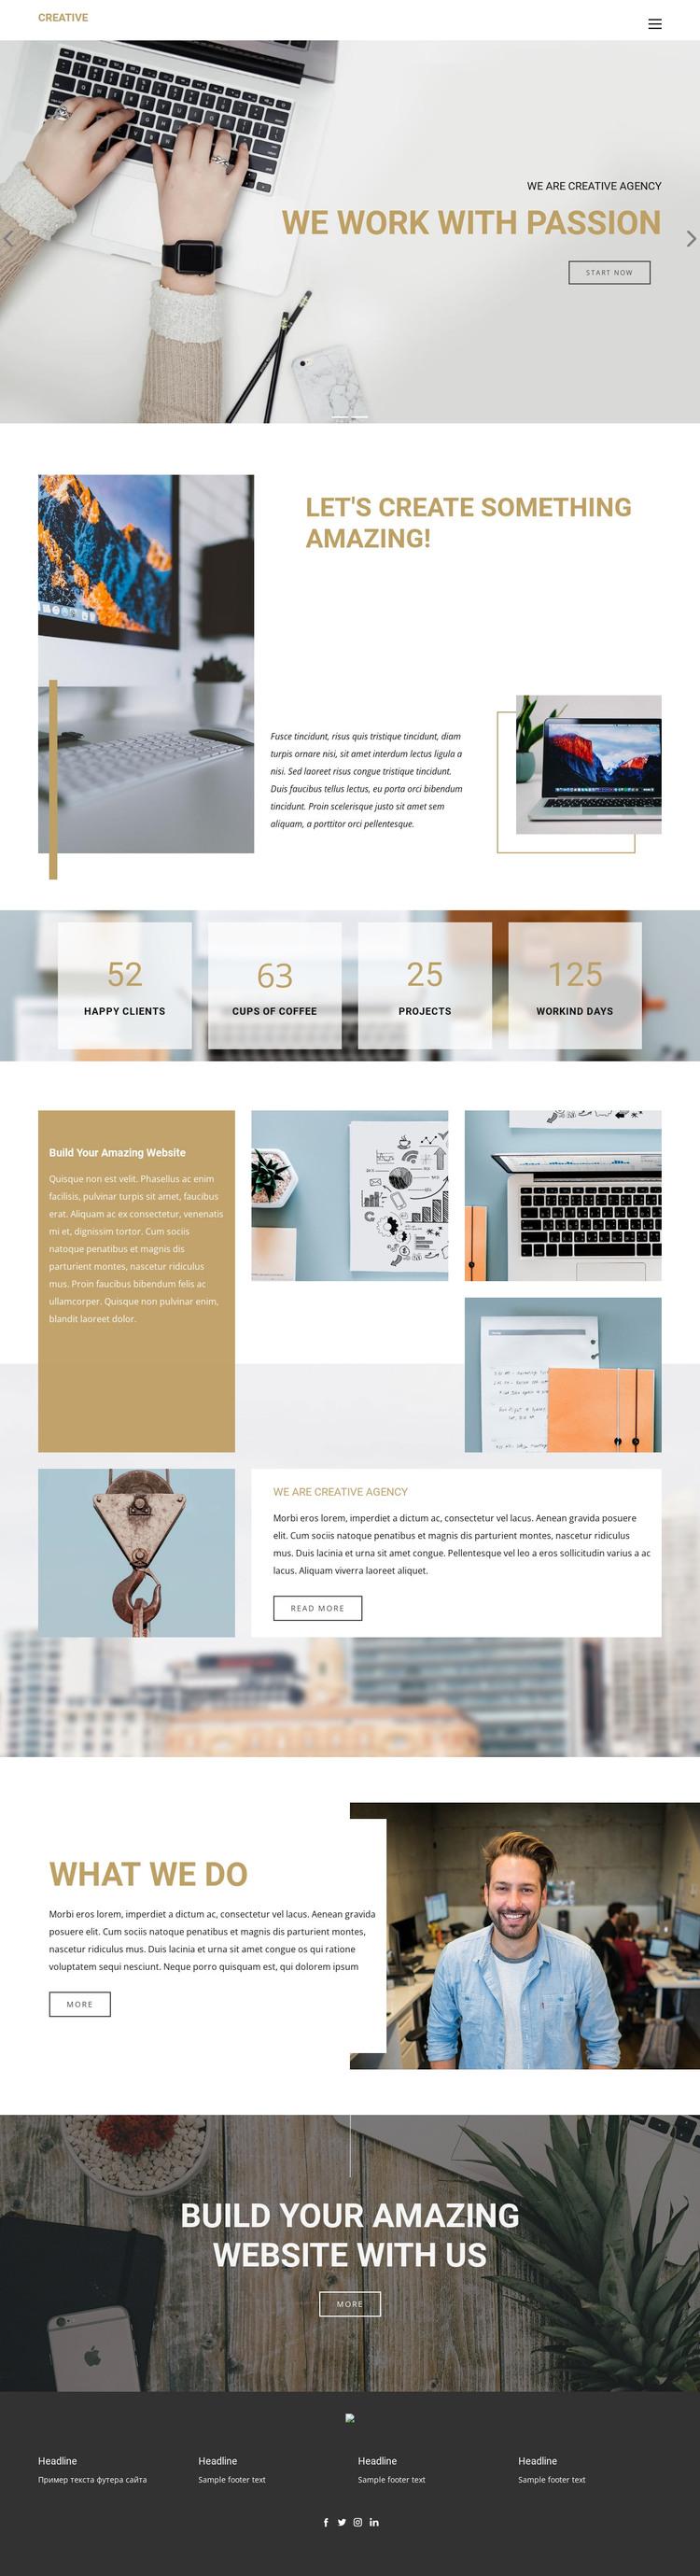 Exceptional creative designs WordPress Theme